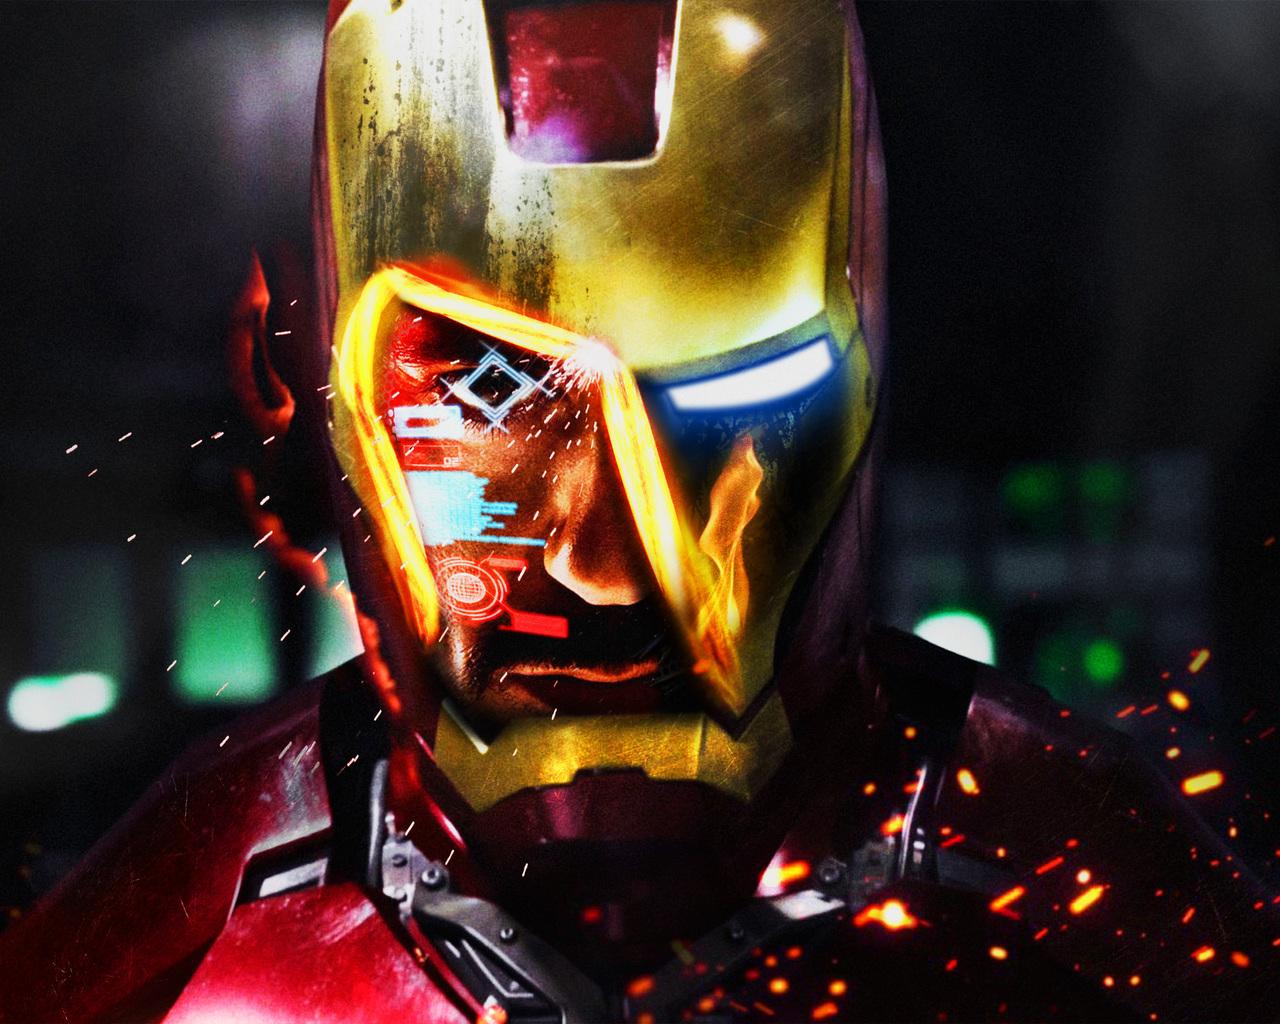 ironman-4k-vx.jpg